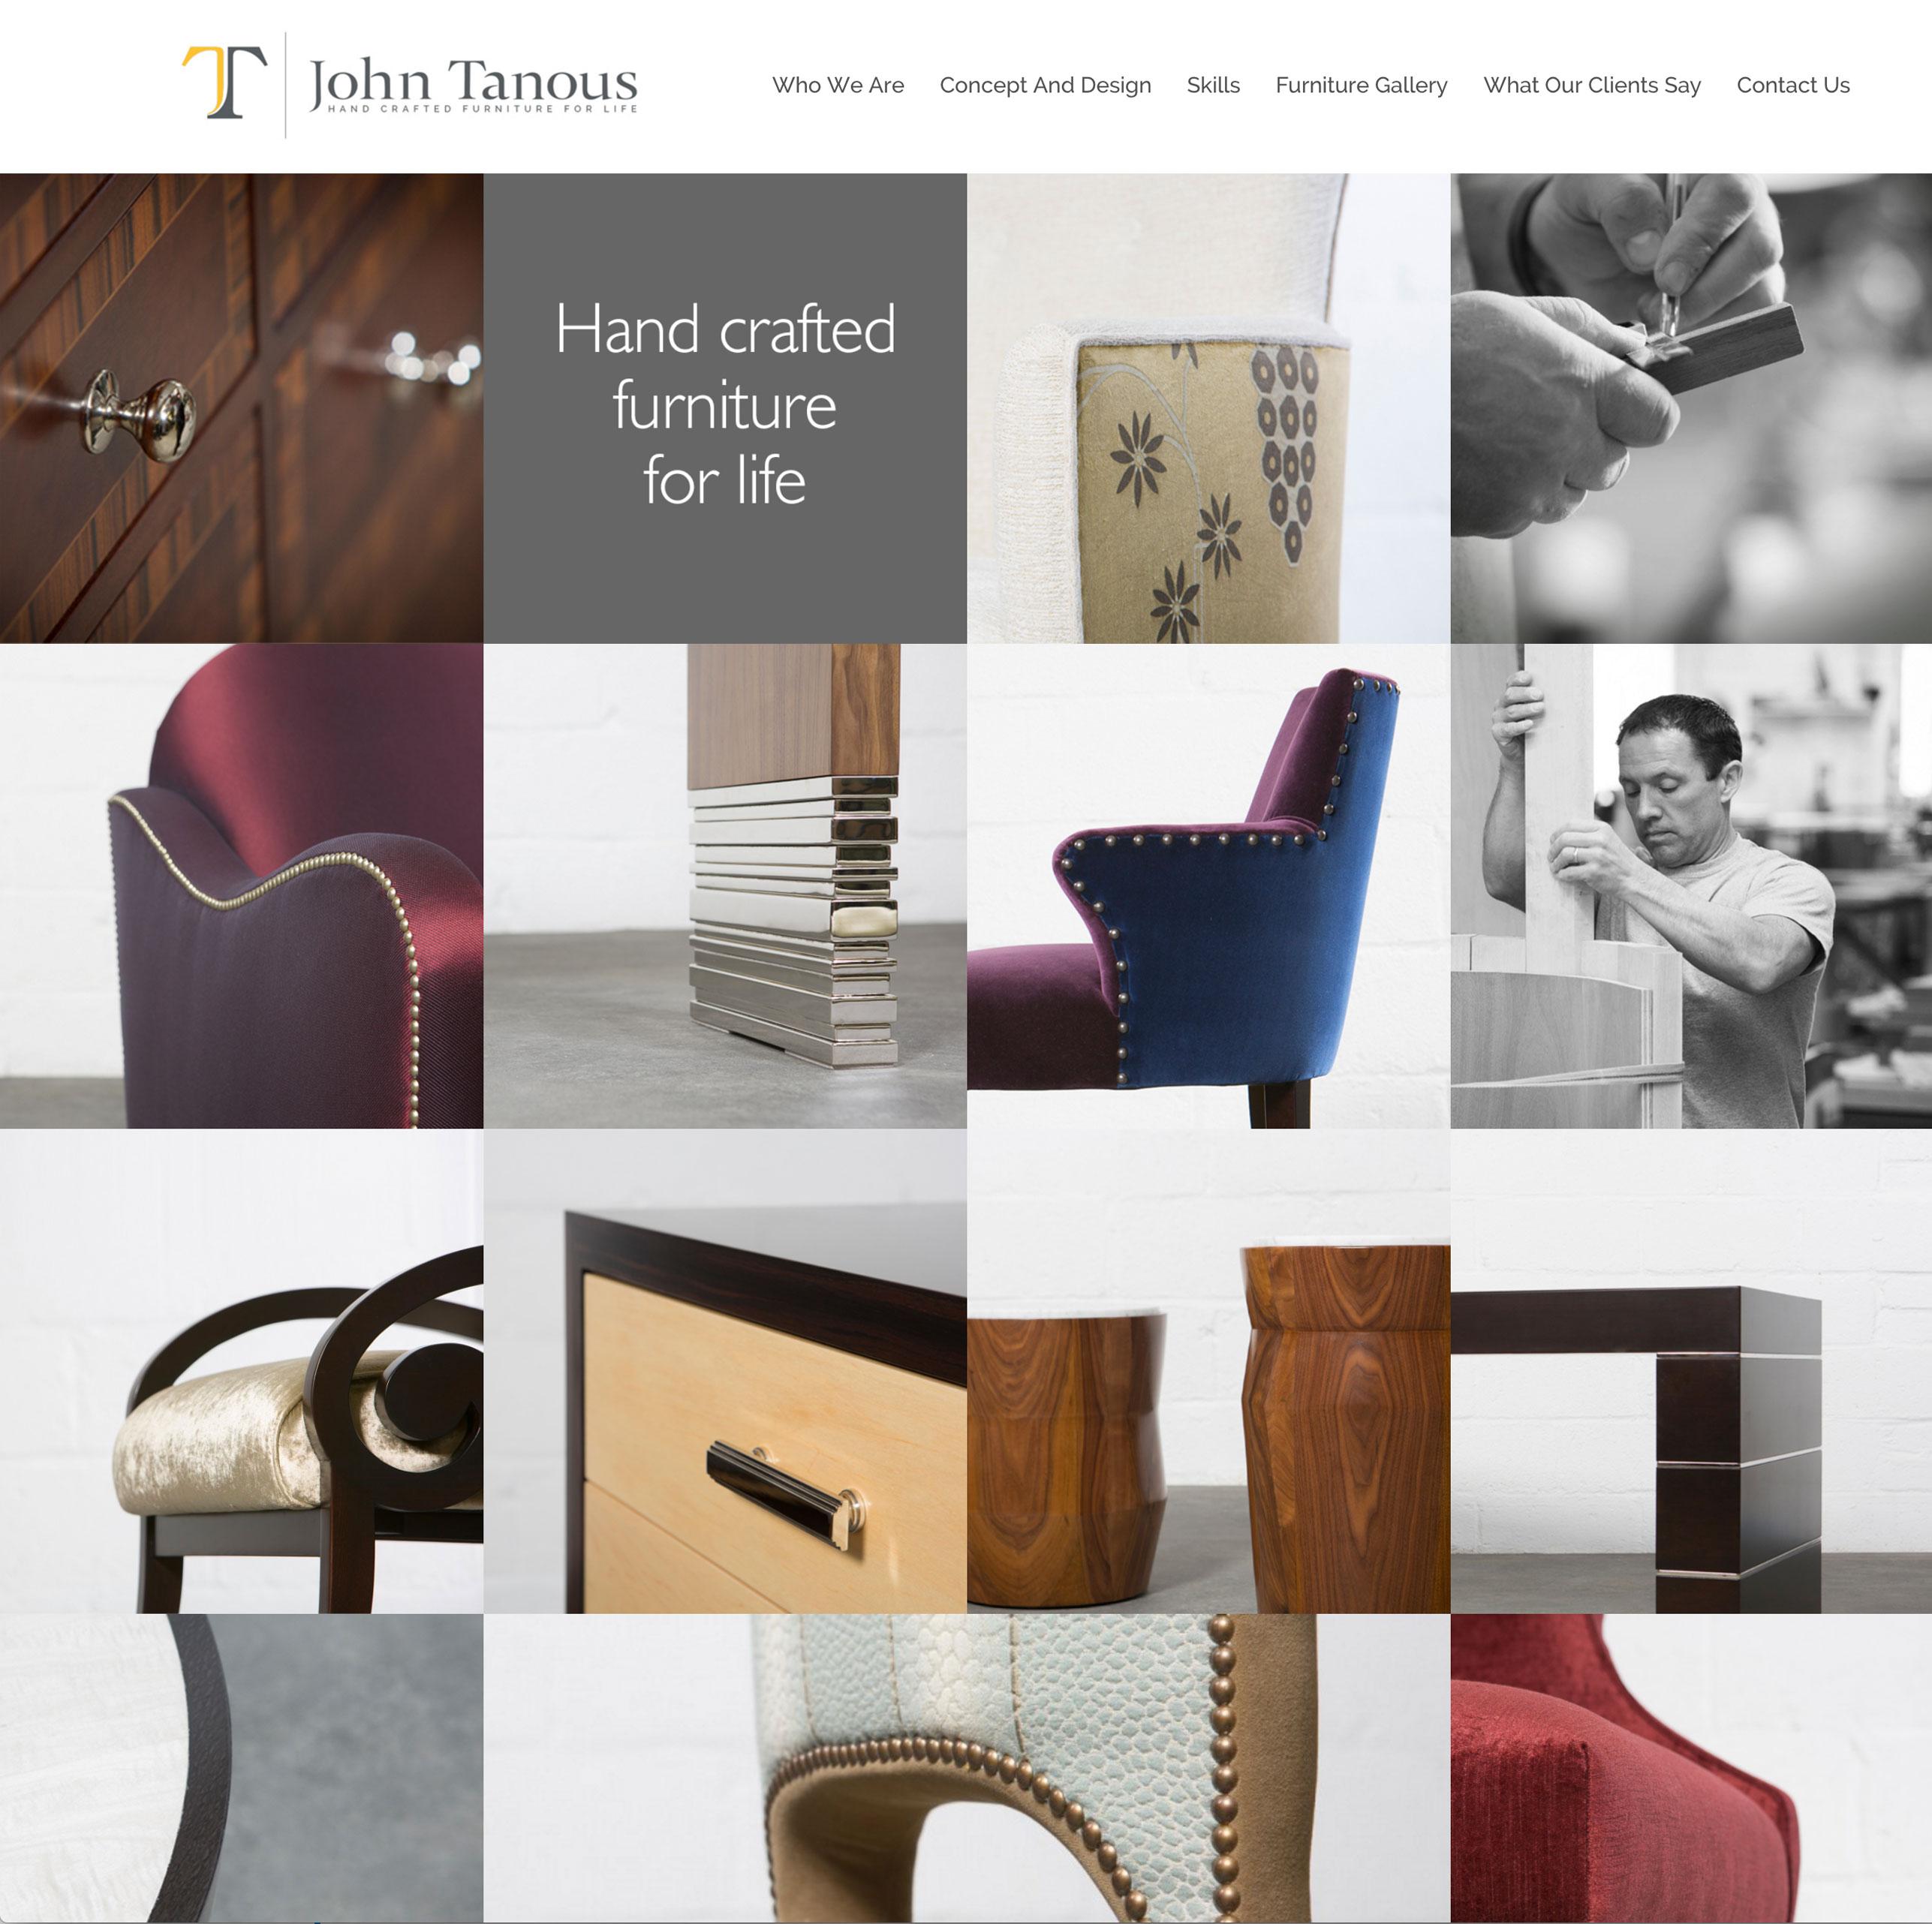 John Tanous